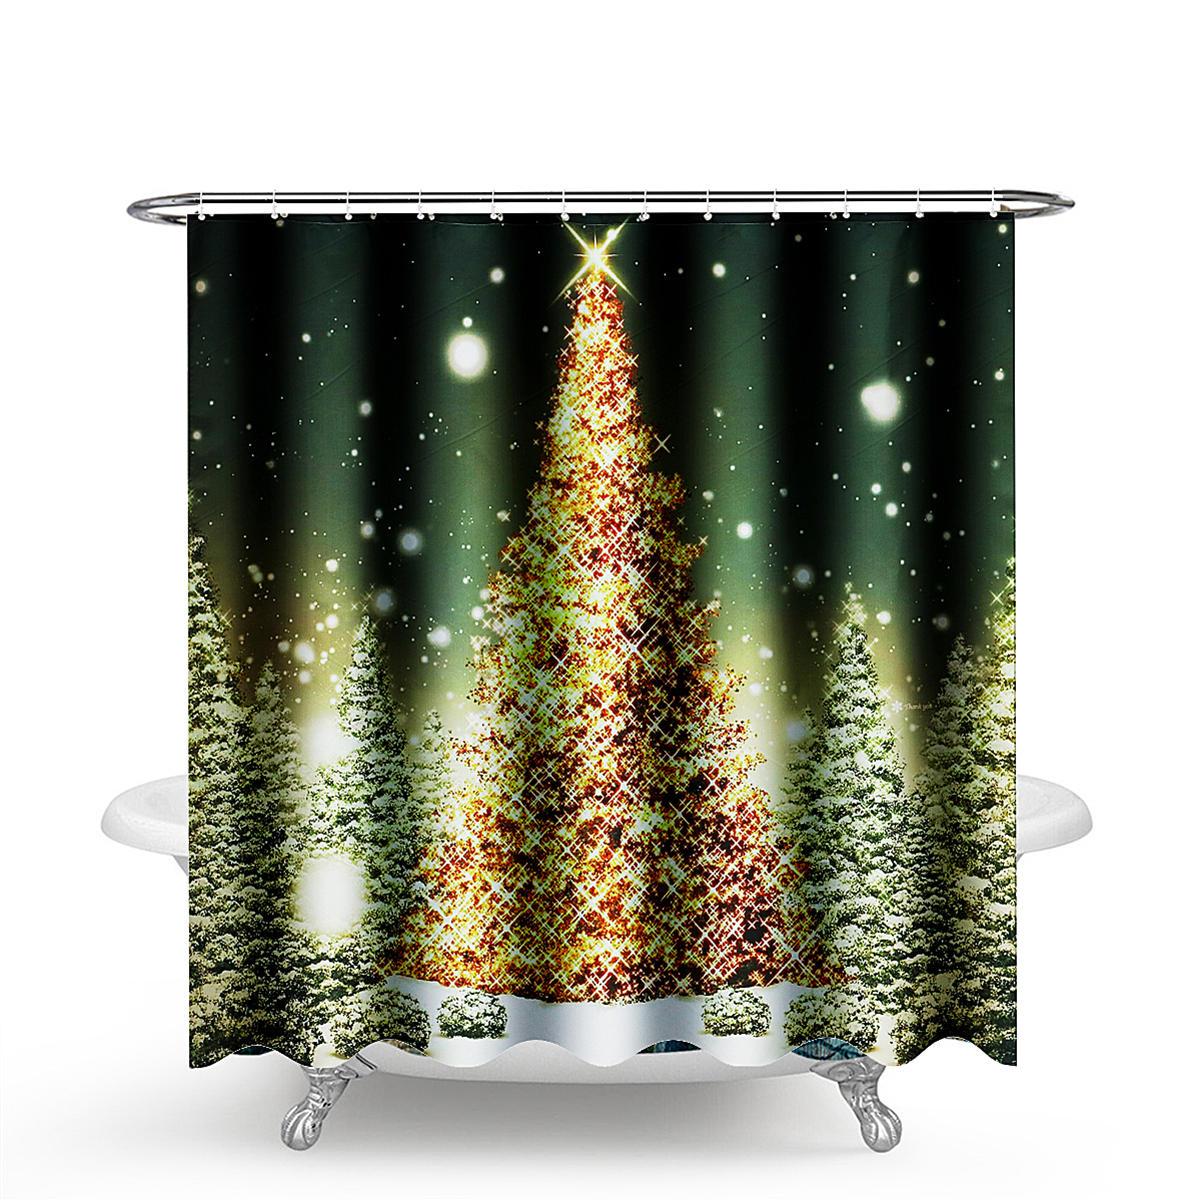 US Christmas Shower Curtain XMAS Waterproof Fabric Bathroom Polyester 12 Hooks